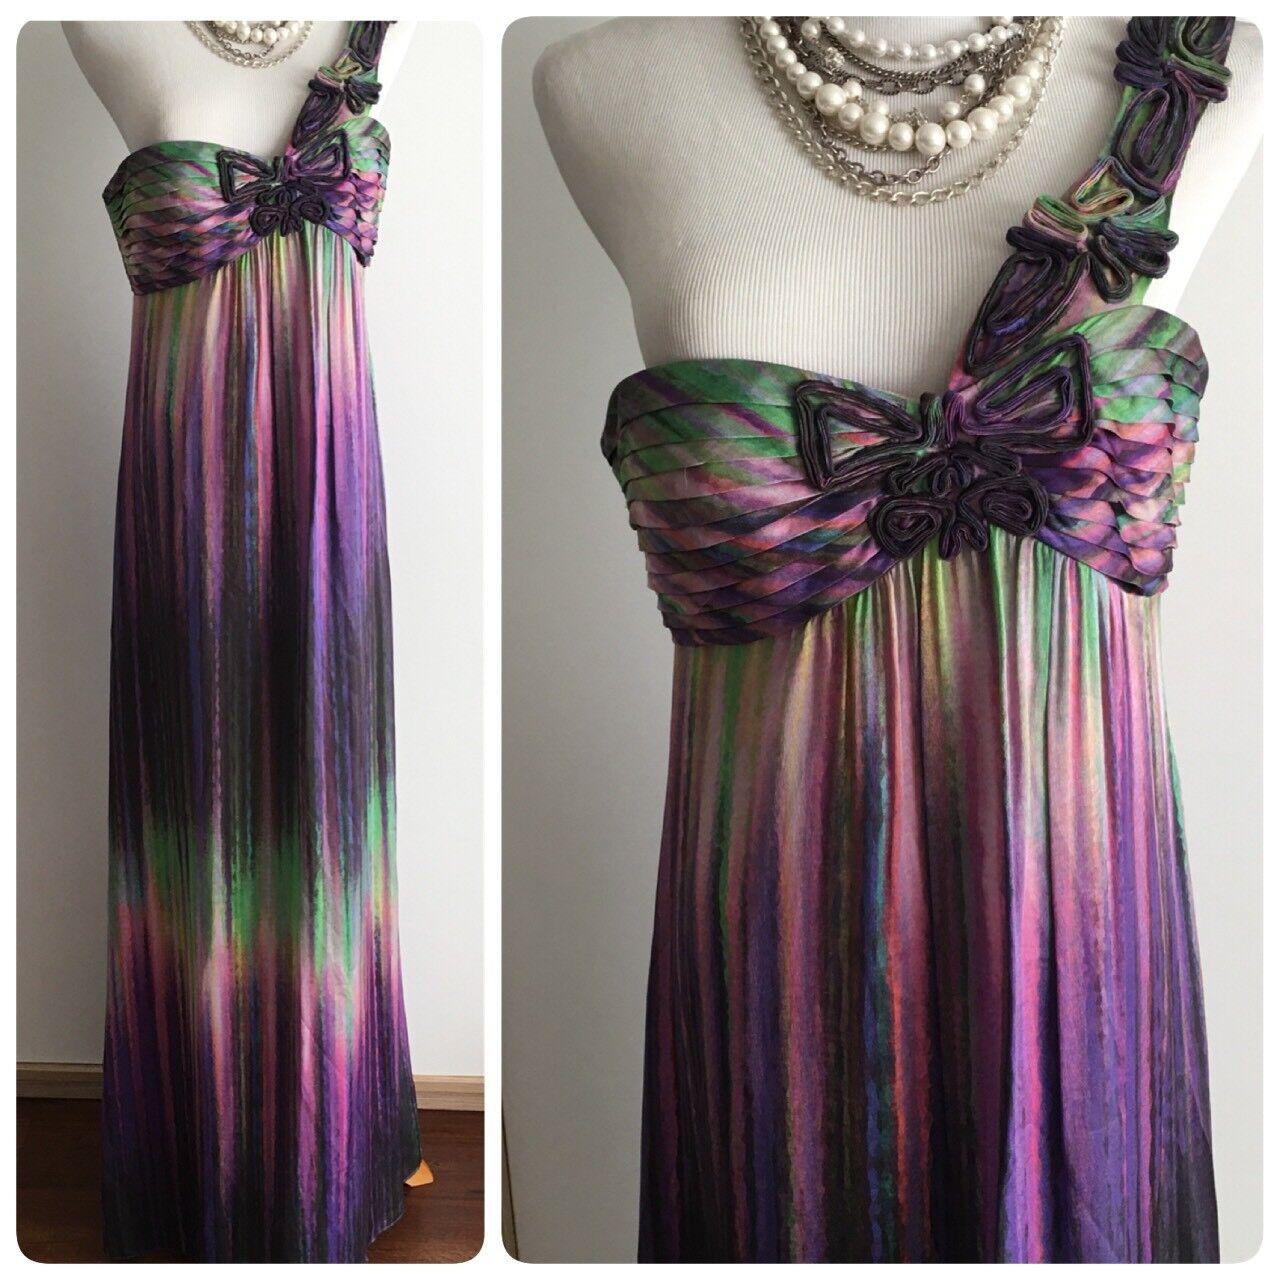 Bcbg maxazria 8 lila maxi dress one shoulder gradient Farbe silk prom cocktail